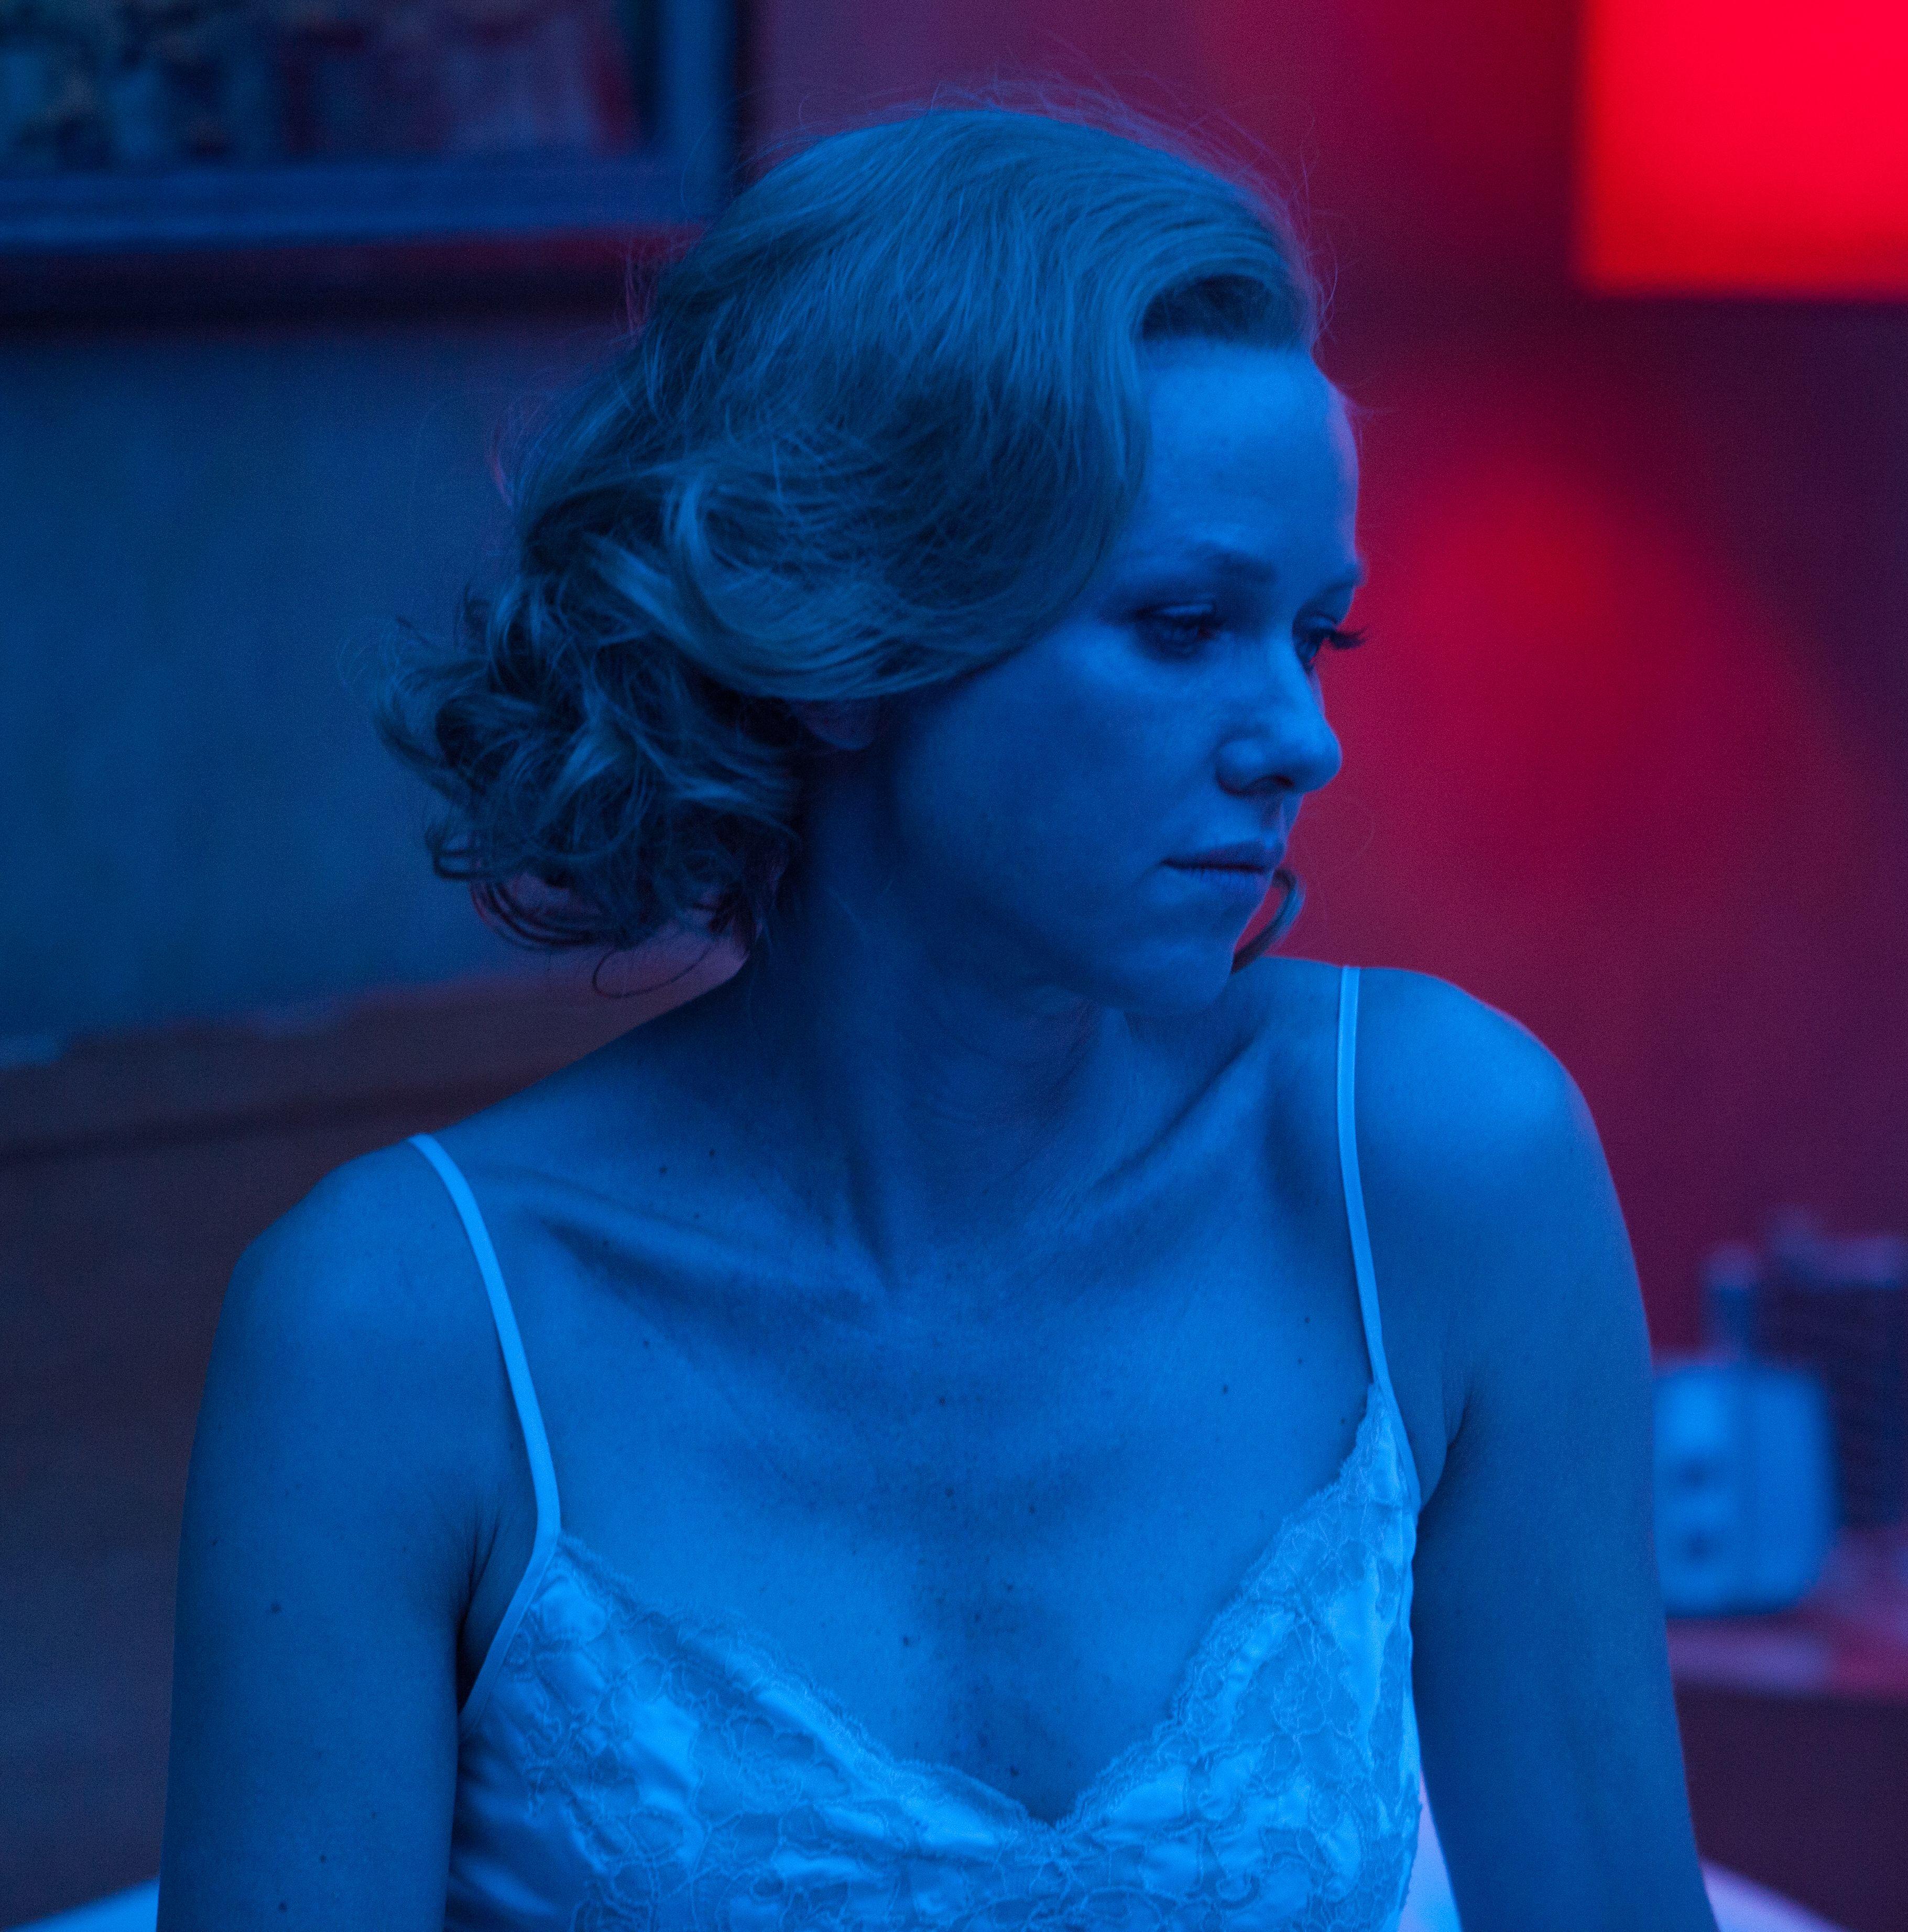 Naomi Watts in blue